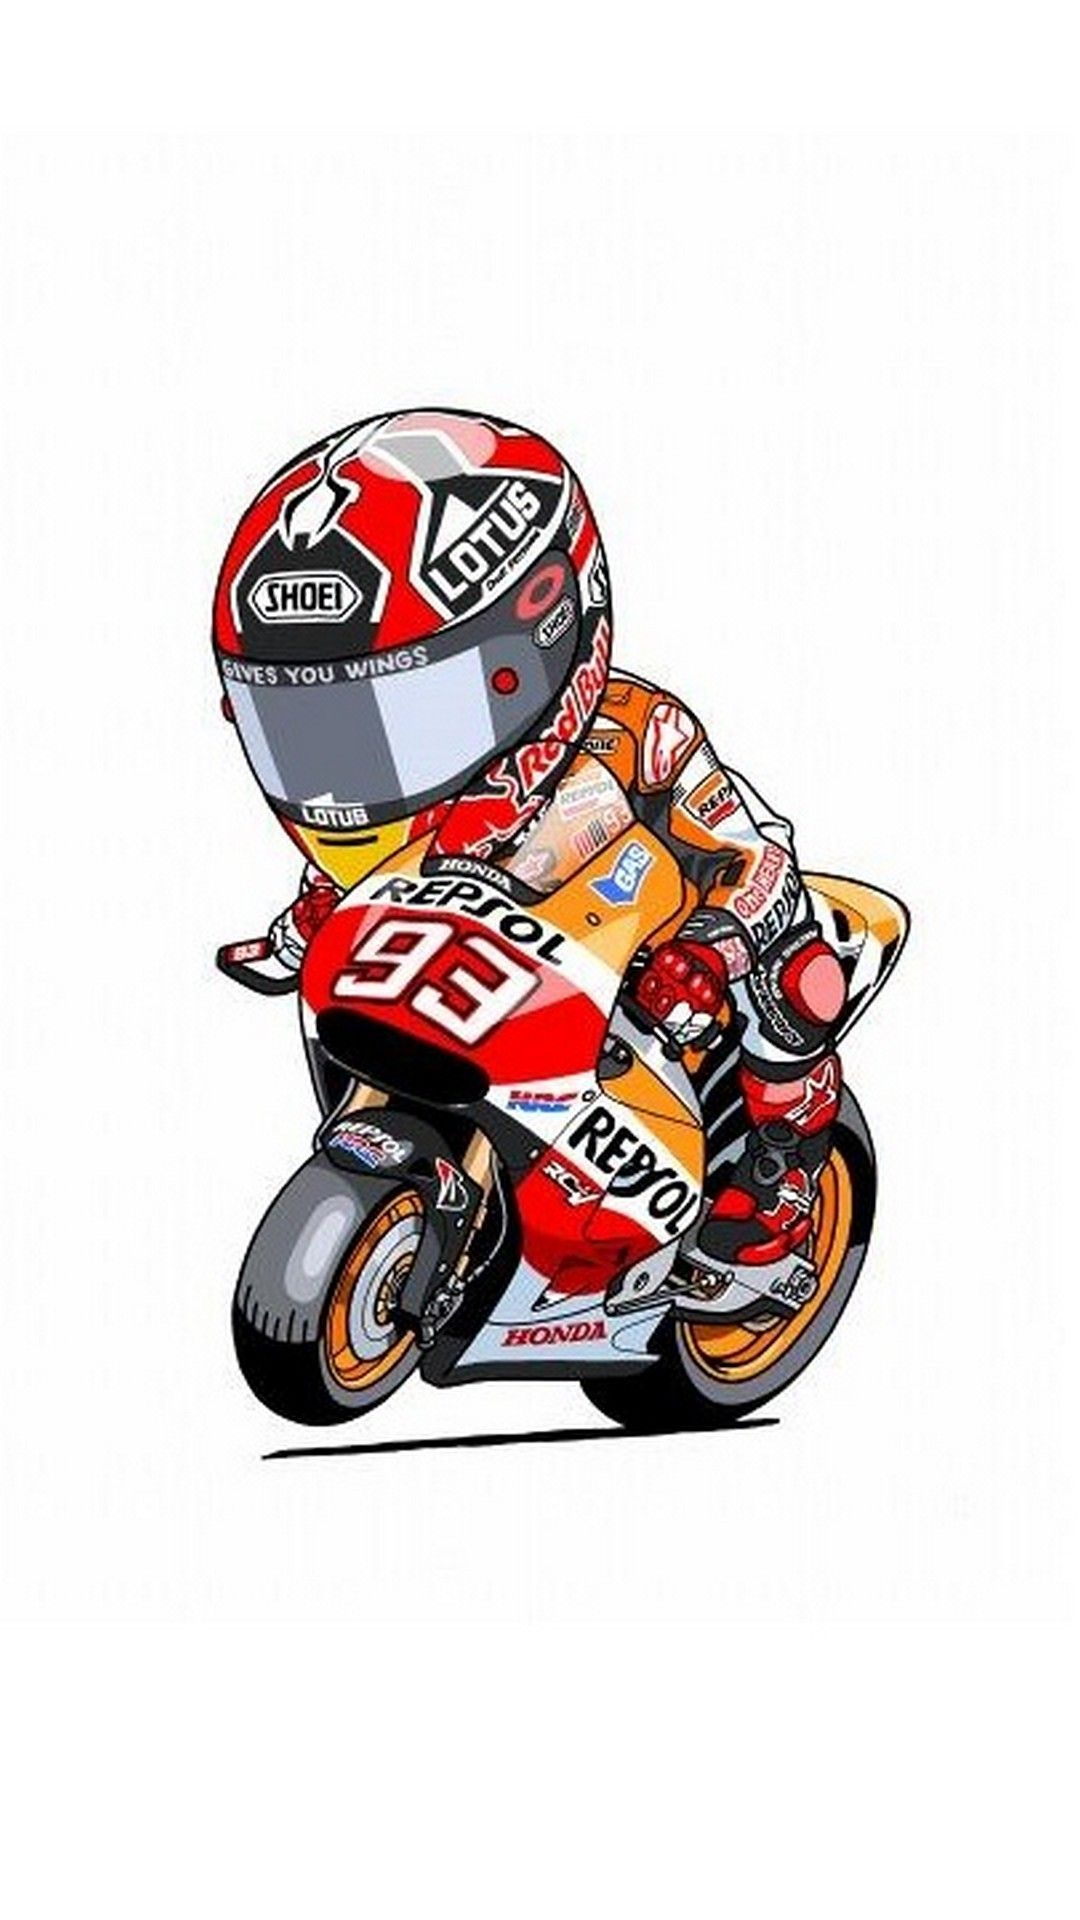 New Iphone Wallpaper Iphone Wallpaper In 2020 Motorcycle Art Marc Marquez Motorcycle Wallpaper